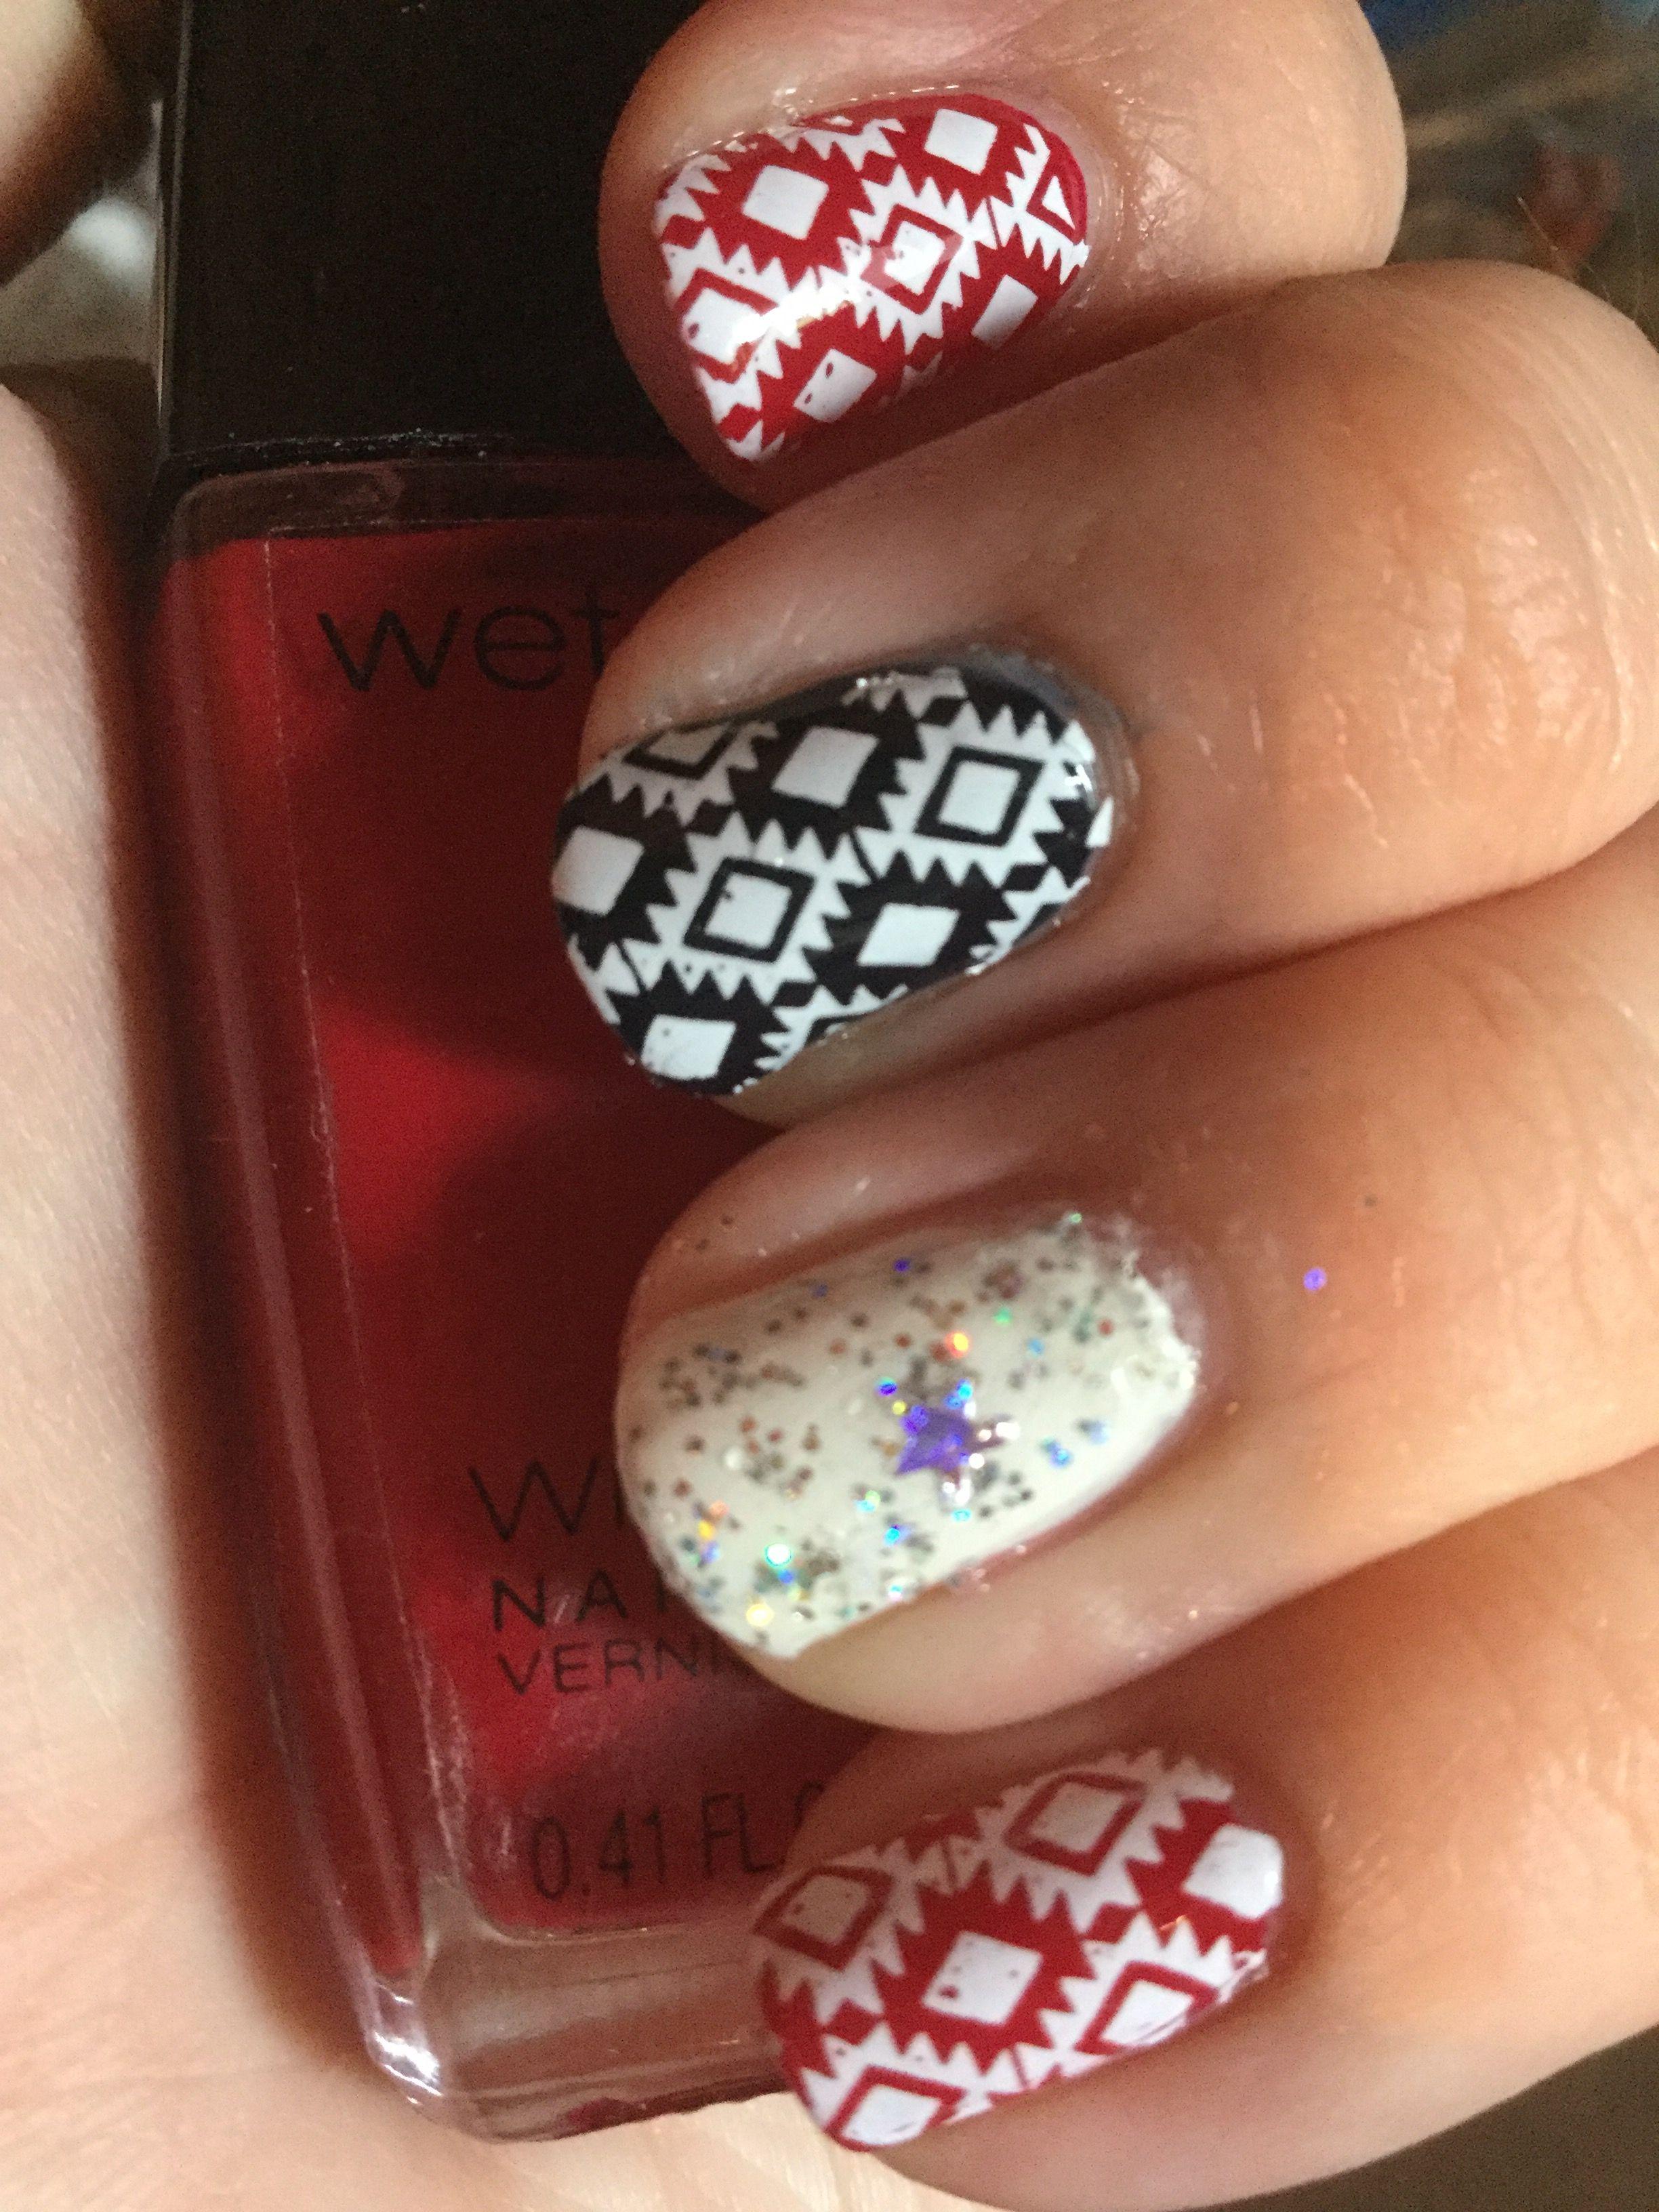 Red, white, navy nails #wetnwild #sallyhansen #bundlemonster | Nails ...